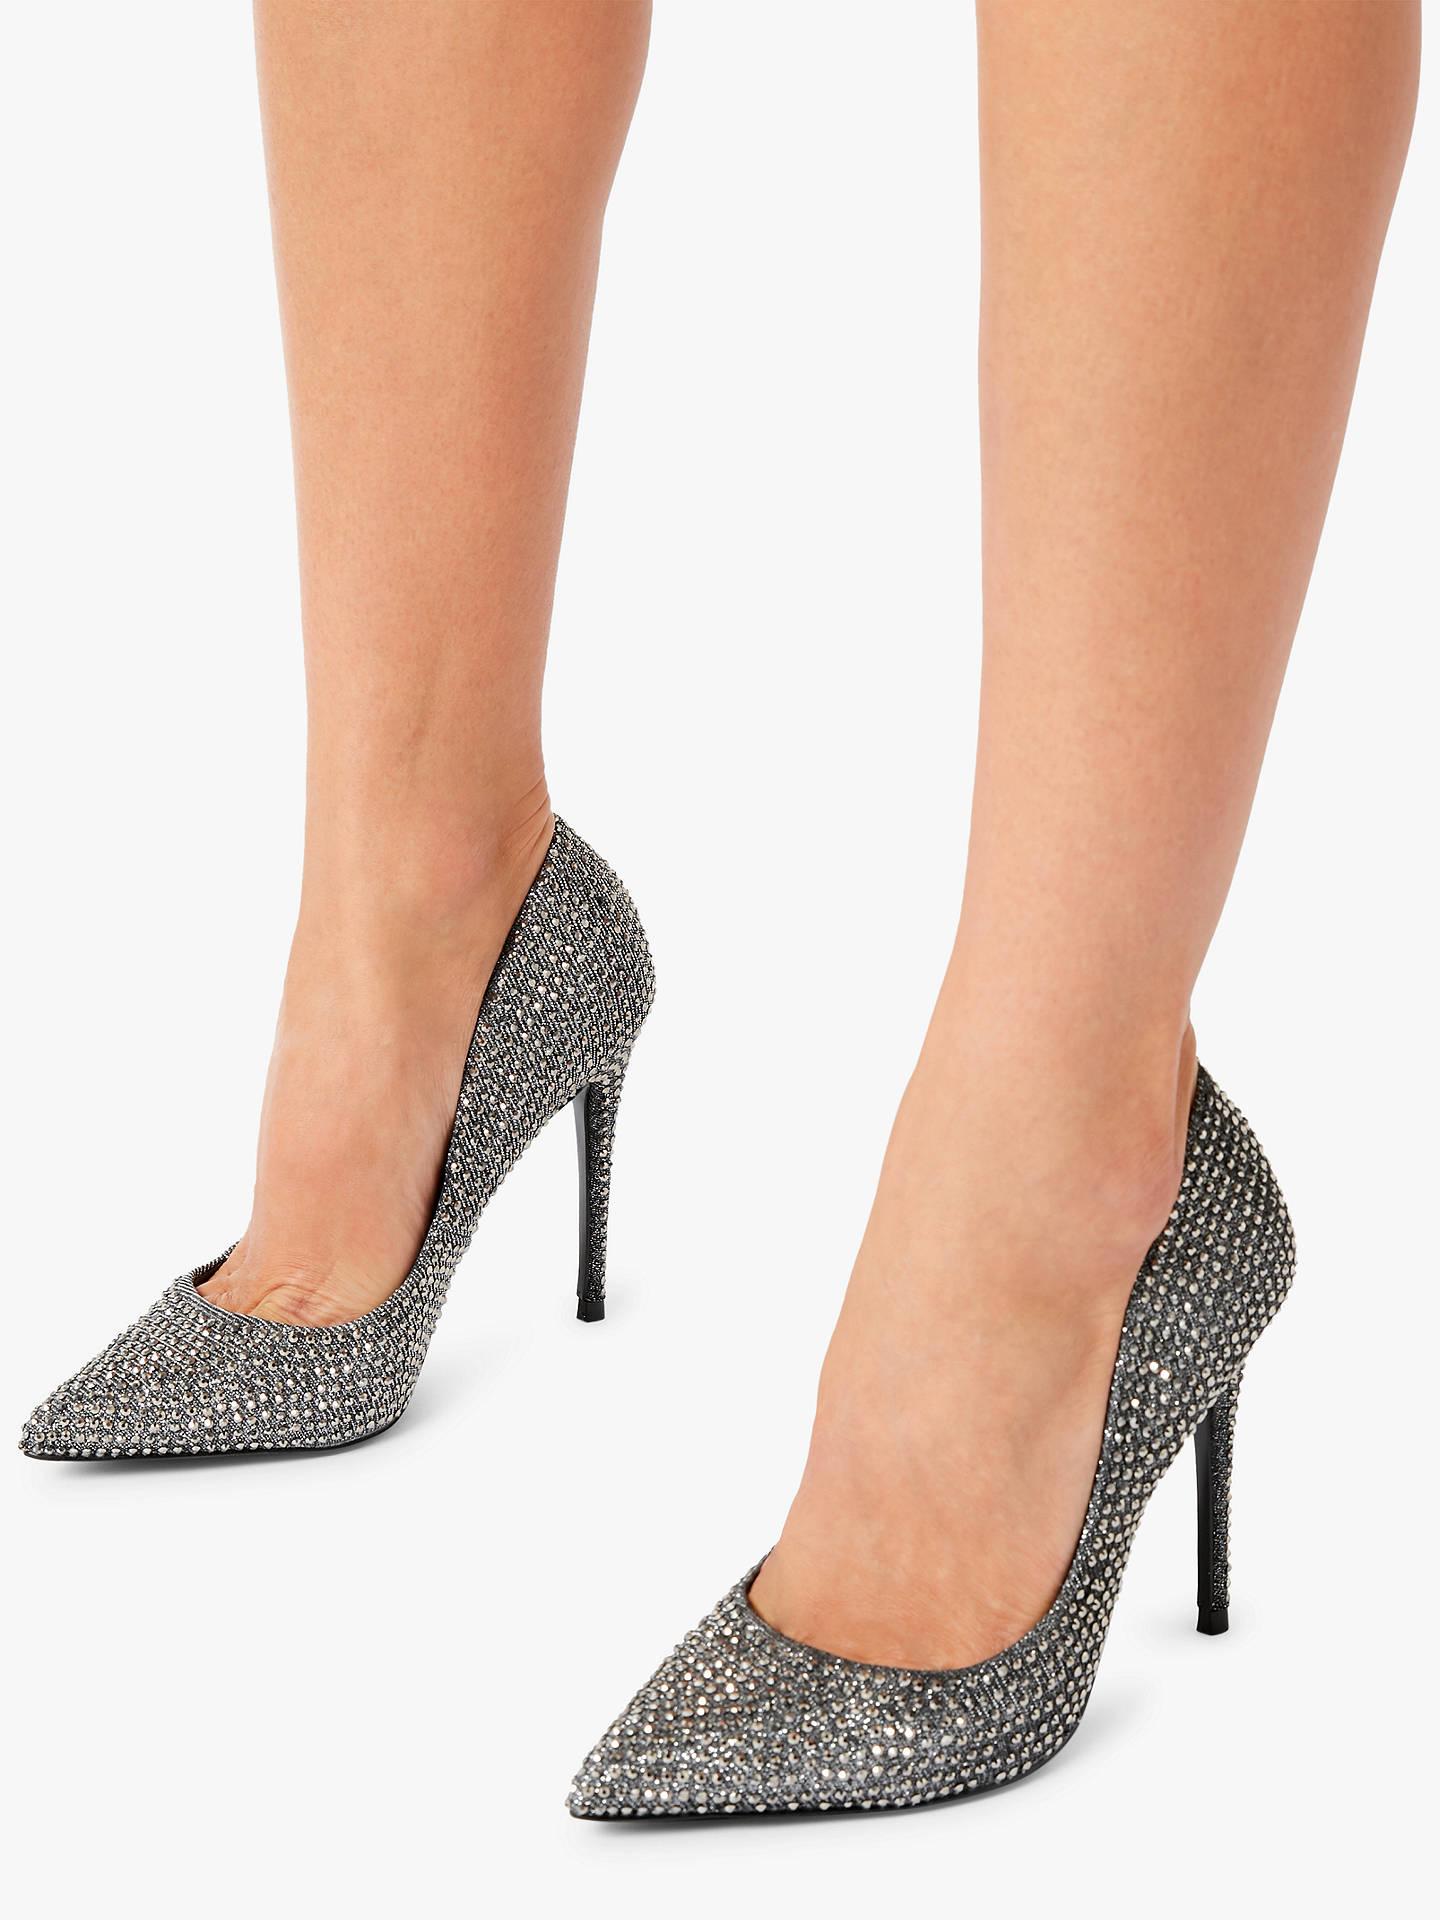 7ac3e070598 Steve Madden Daisie Stiletto Heel Court Shoes, Pewter Met at John ...